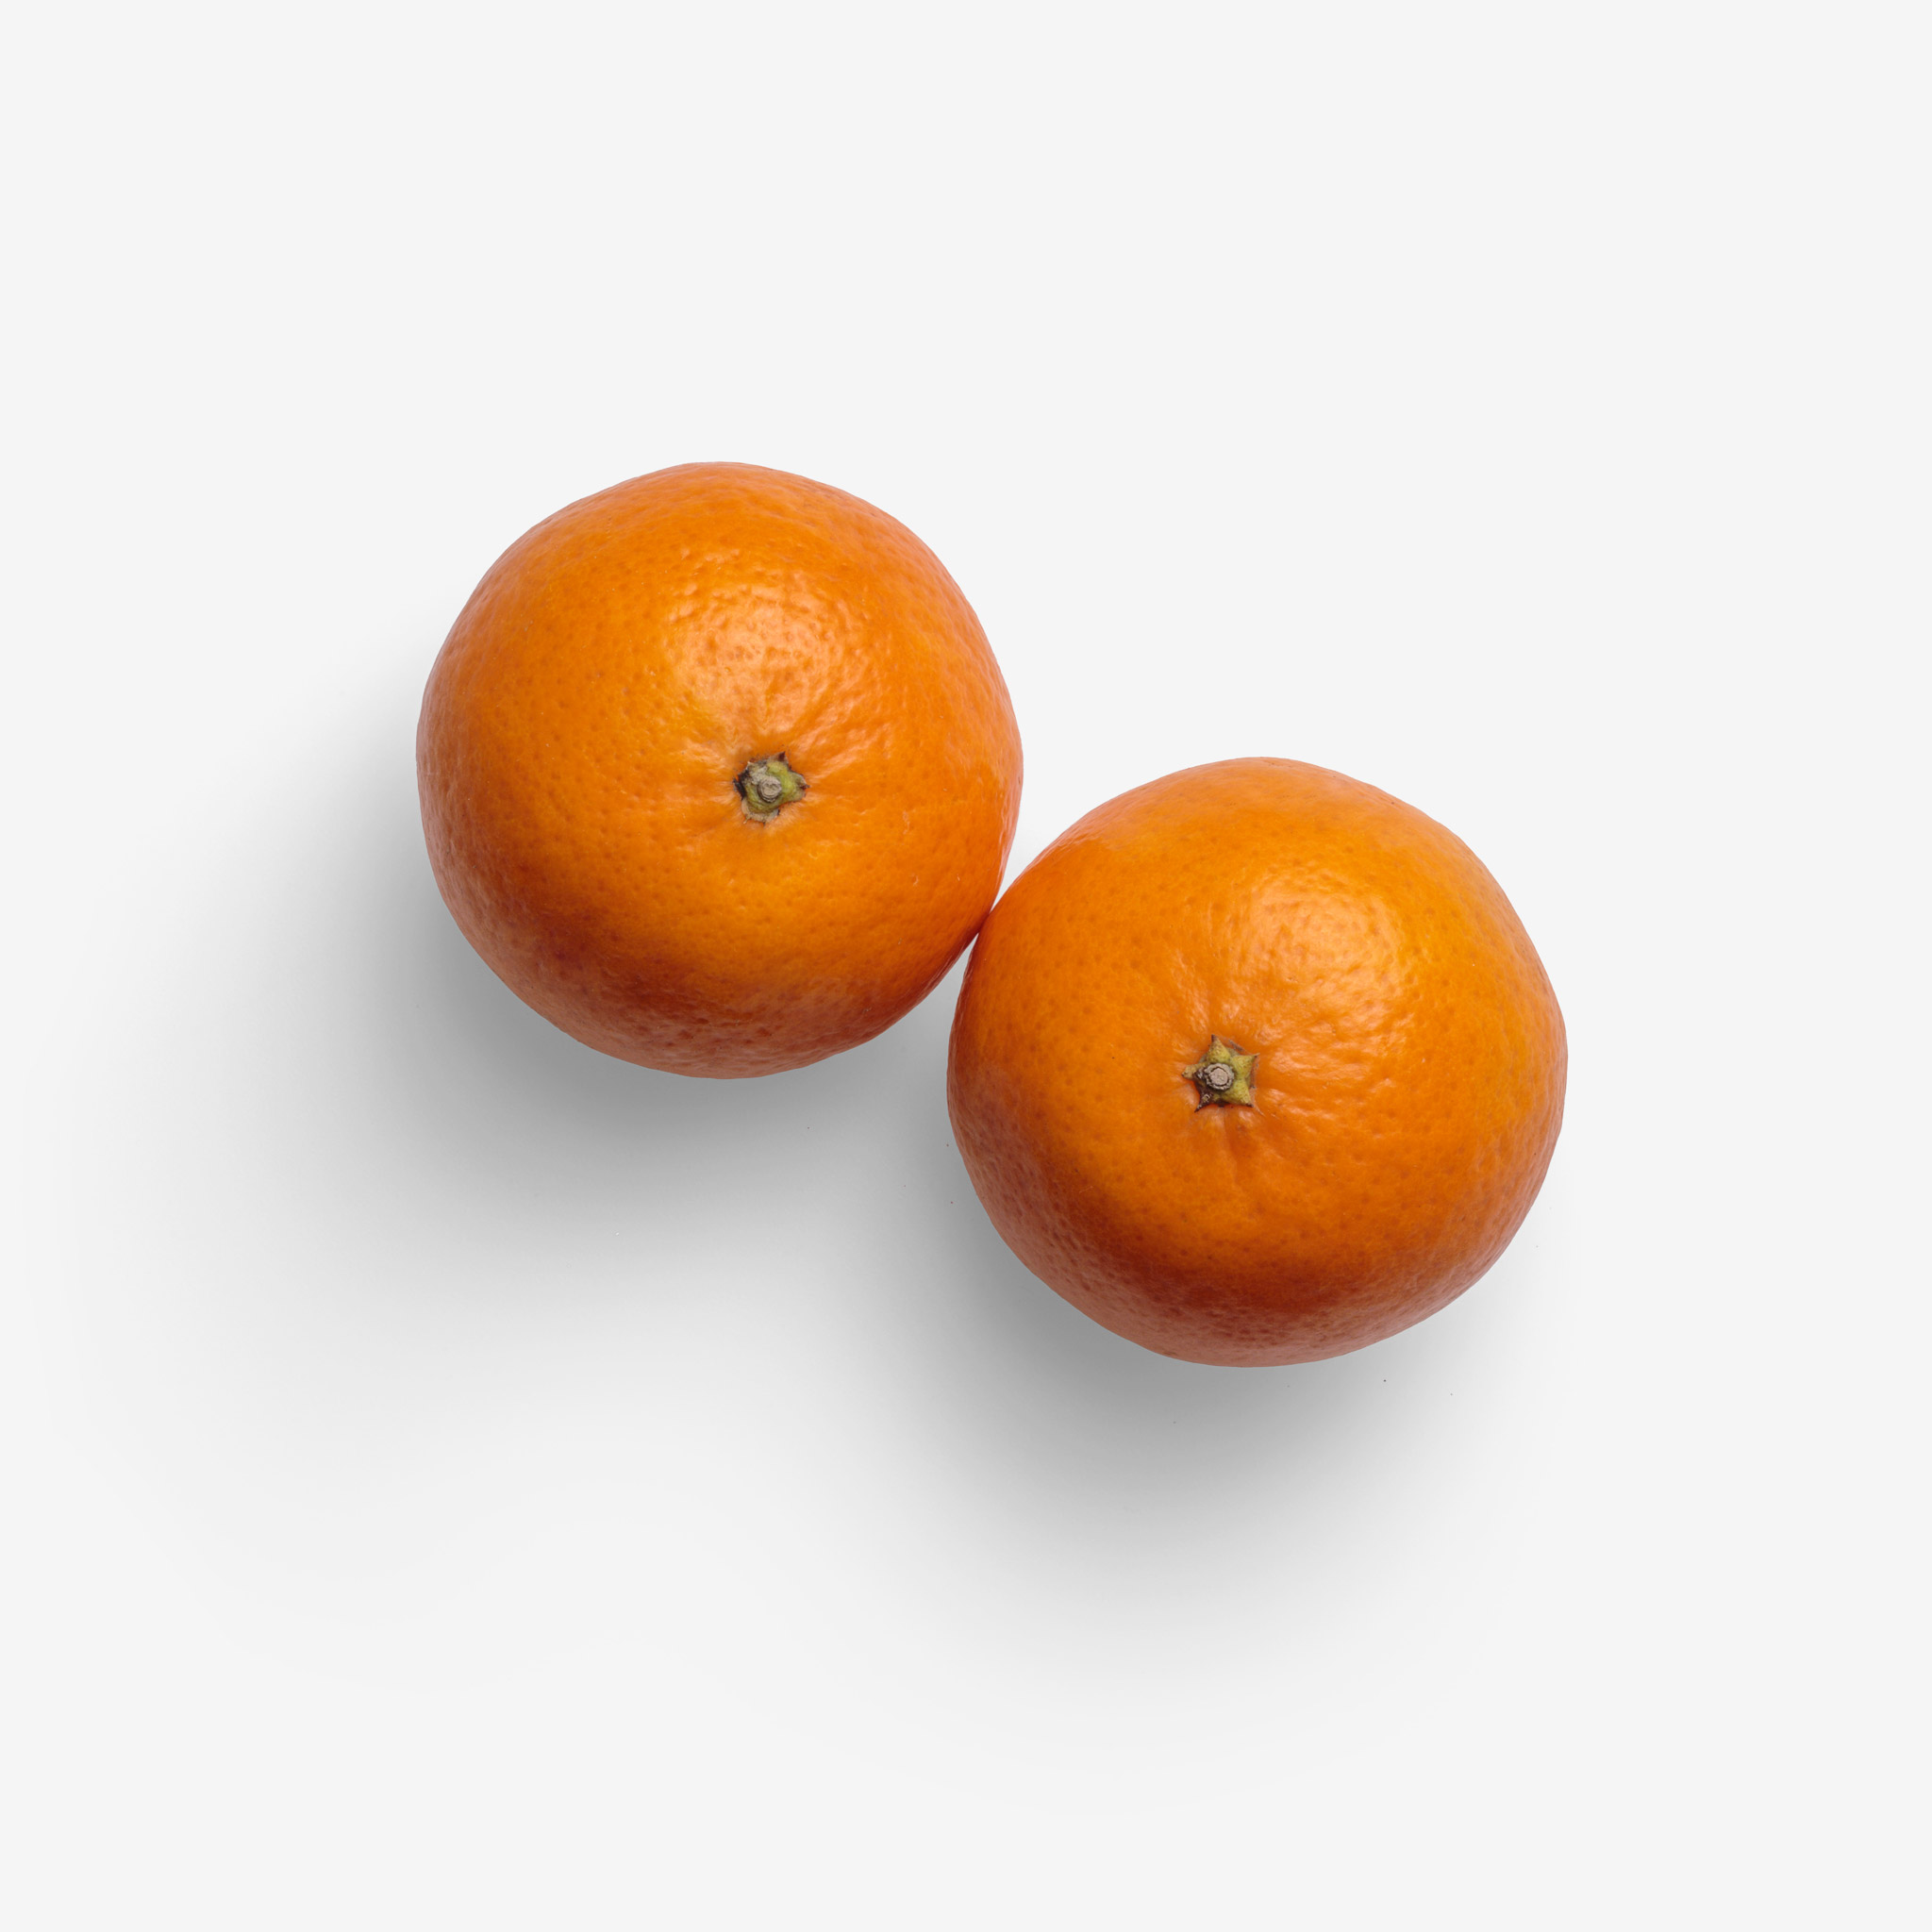 Orange image asset with transparent background